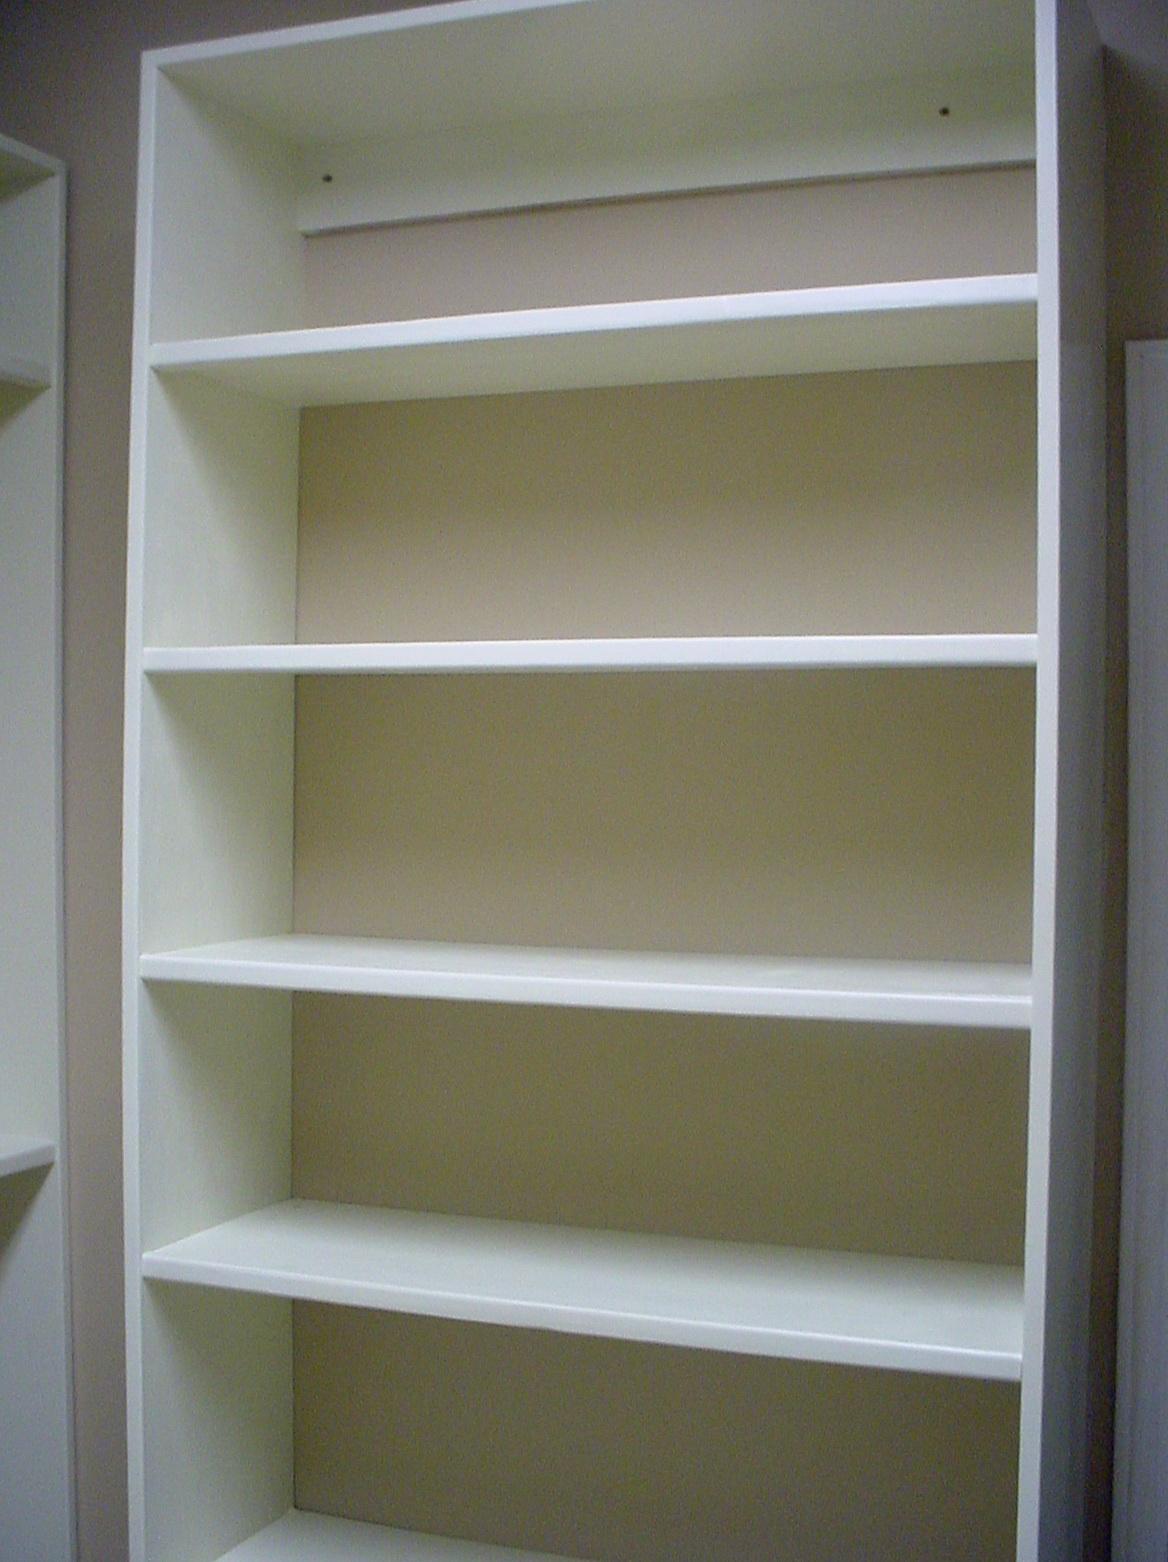 Shelving Units For Closets